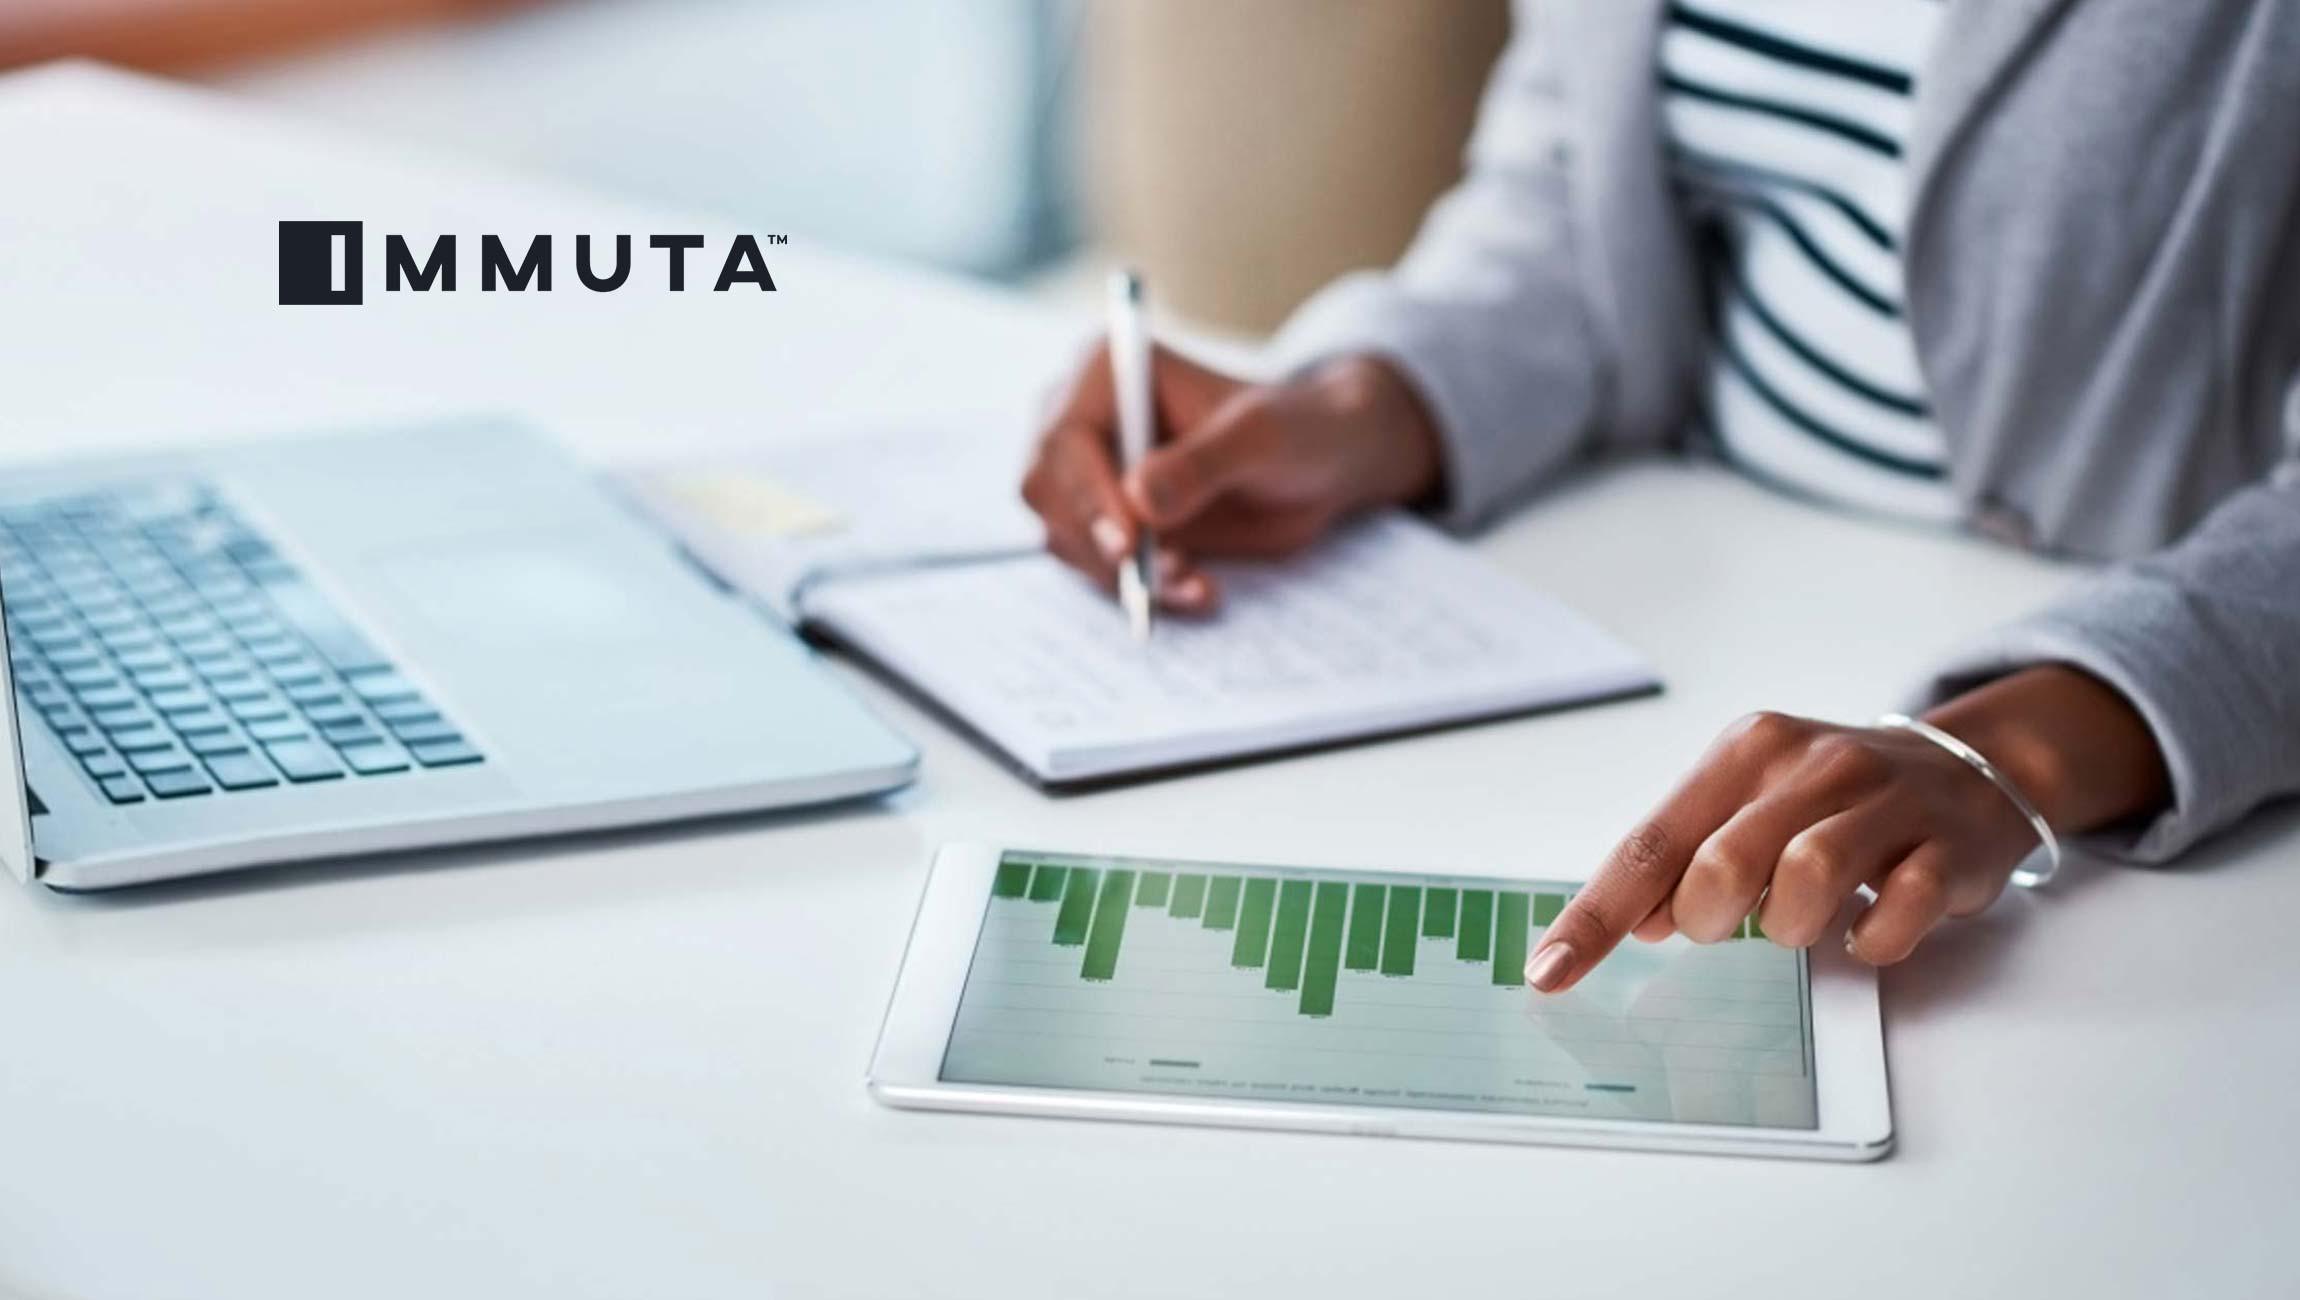 Immuta Announces $90 Million in Series D Funding 1